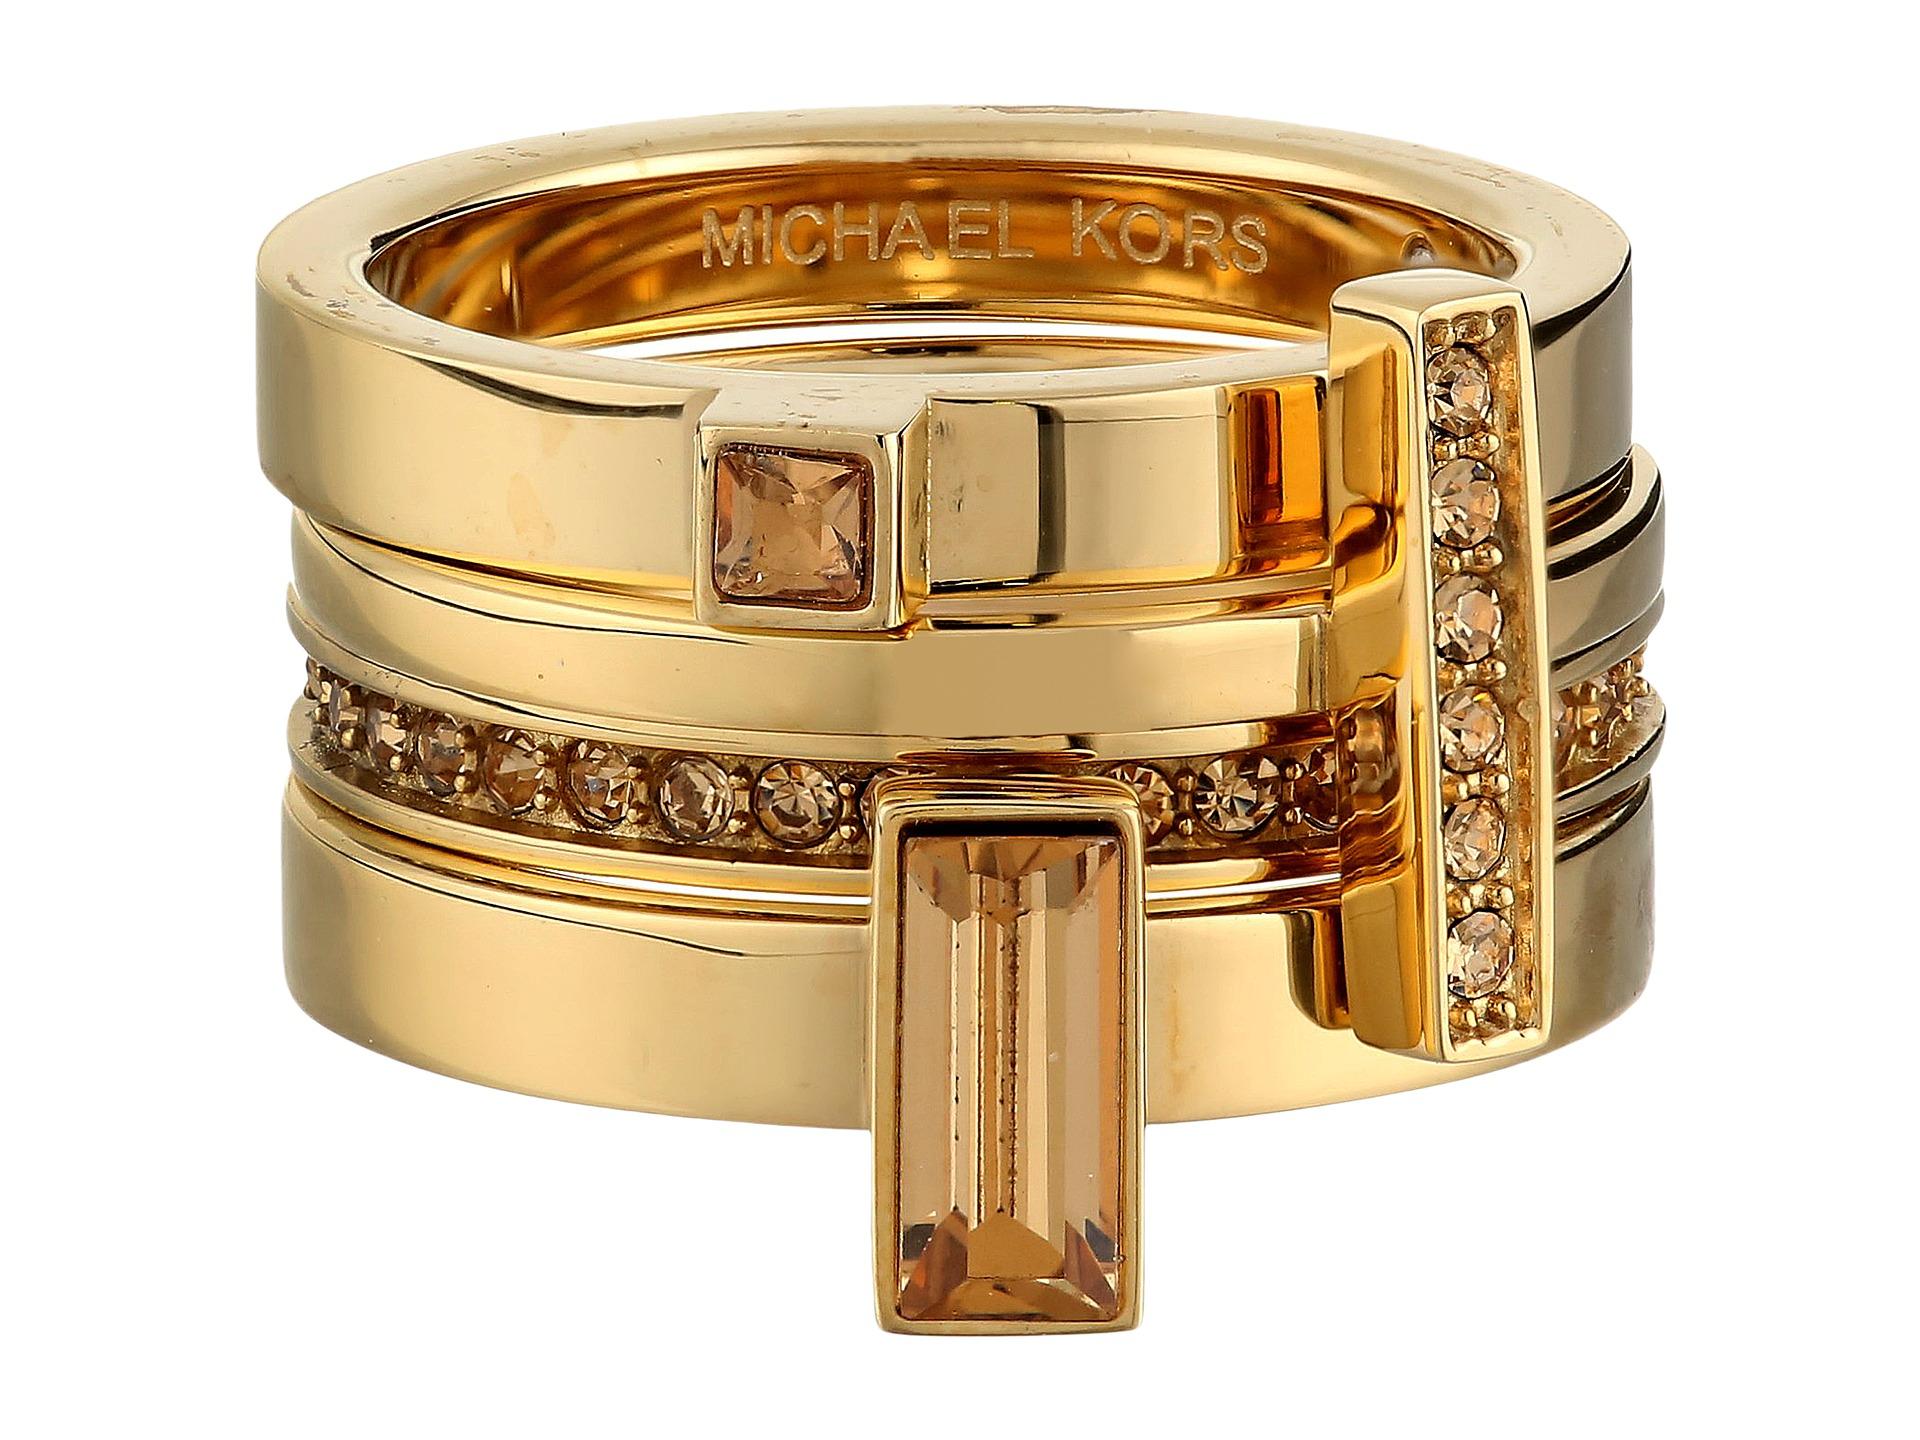 michael kors collection brilliance stackable rings. Black Bedroom Furniture Sets. Home Design Ideas